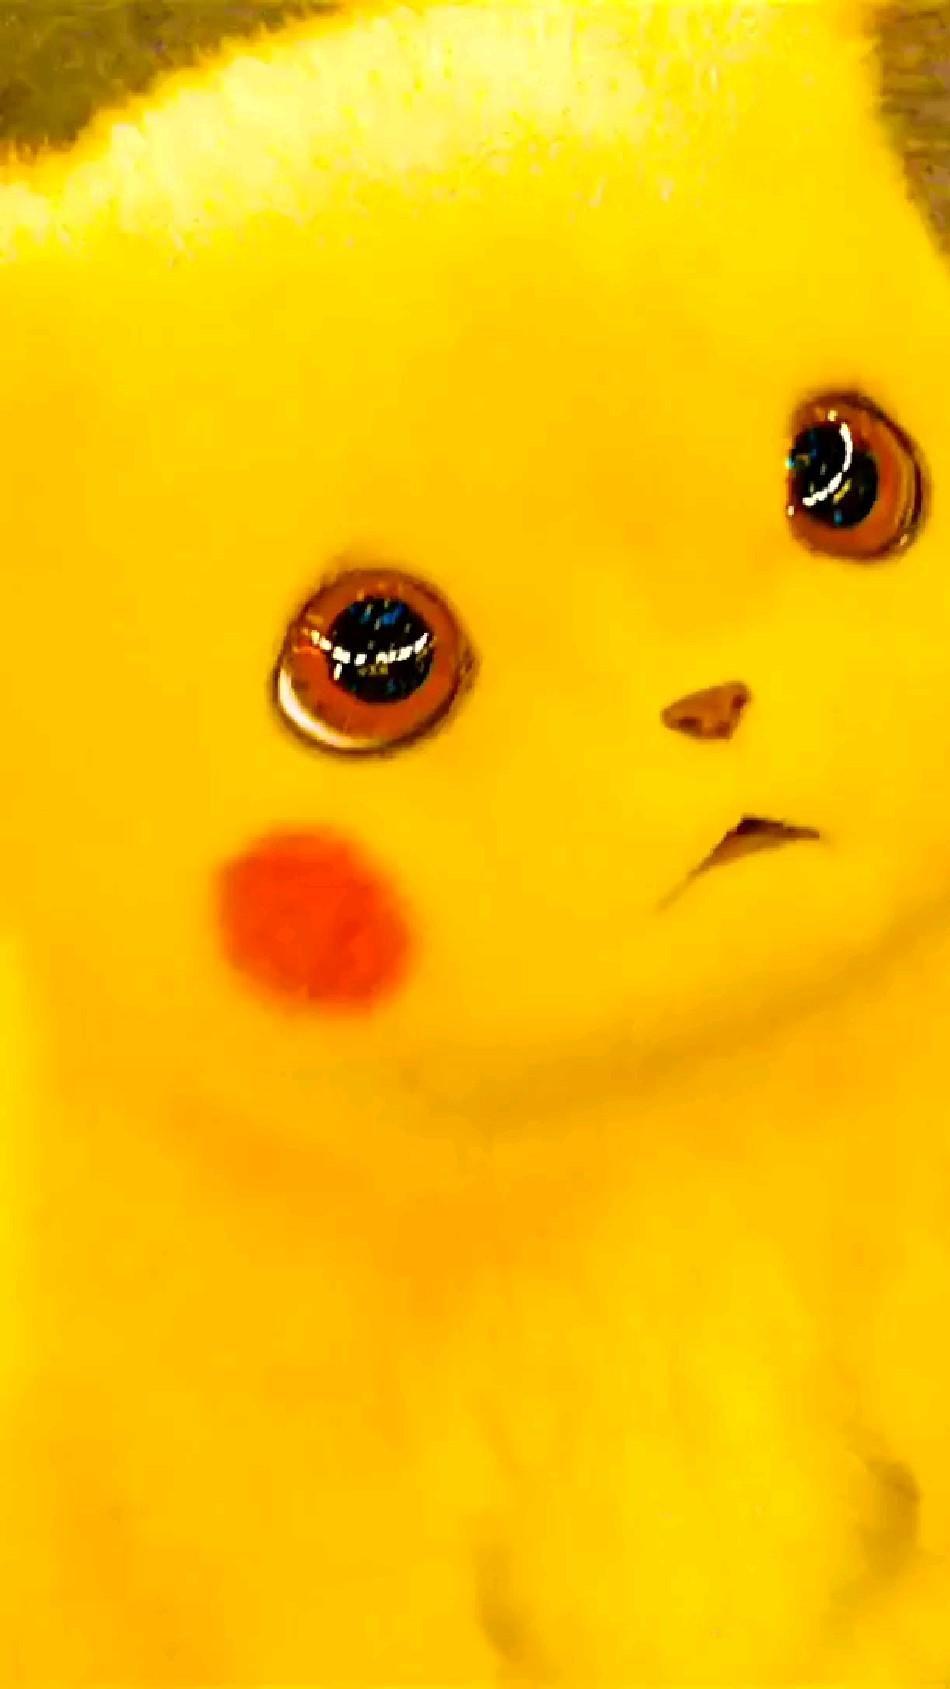 Pika Pika Boo ❤️ Pikachu